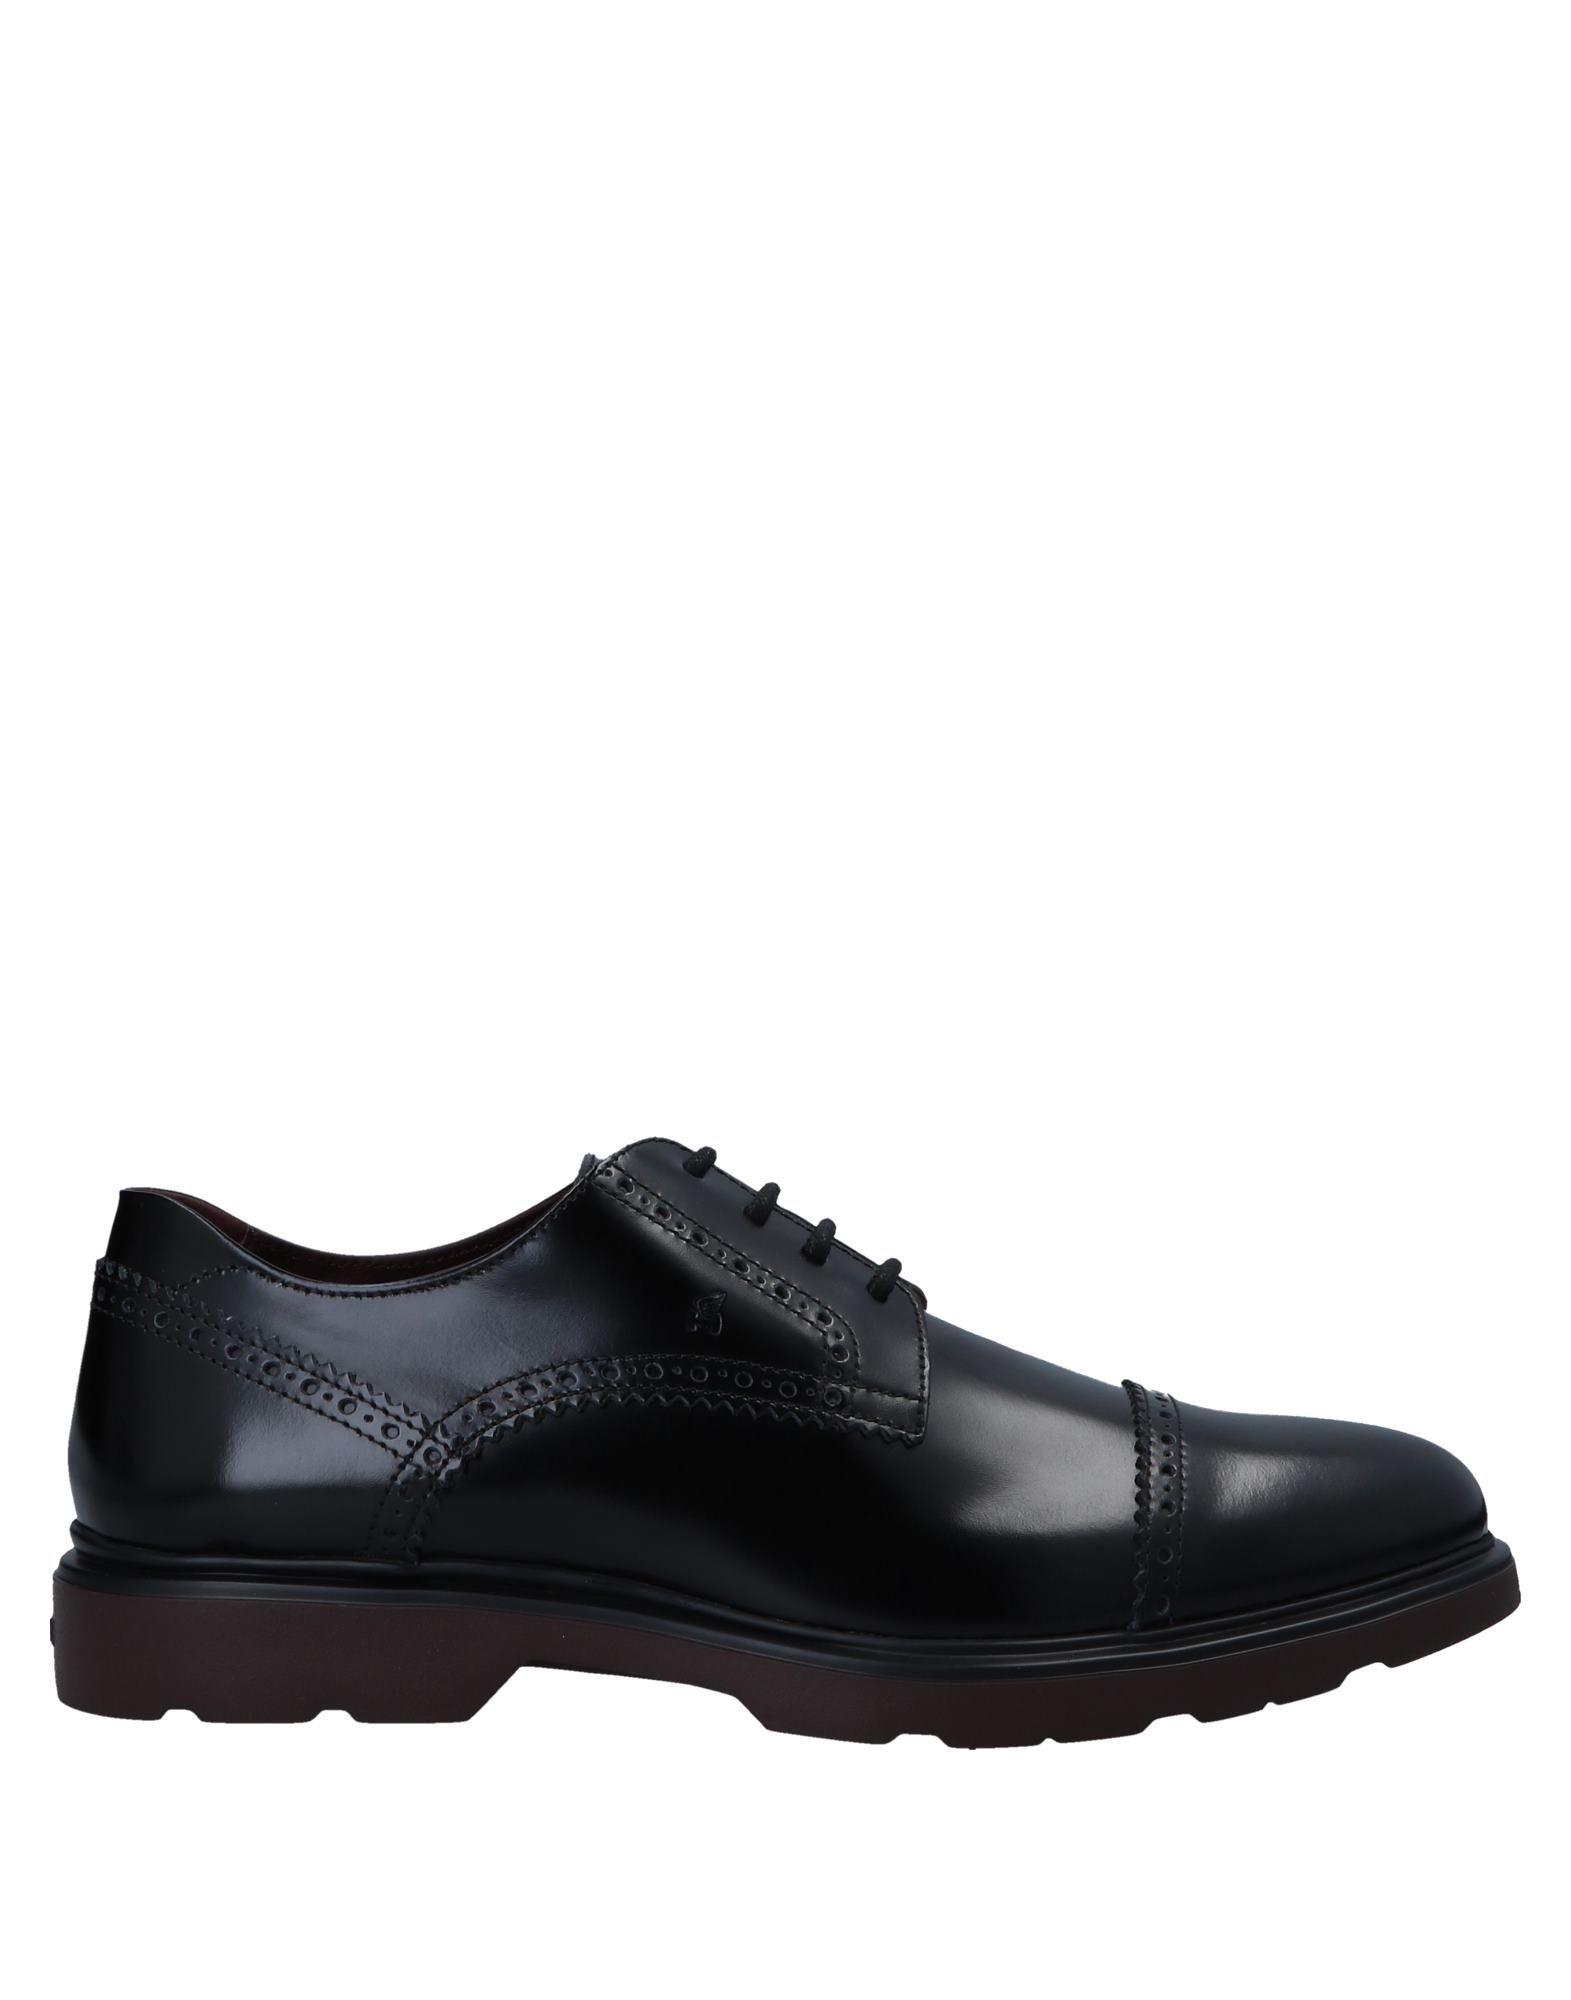 Hogan Schnürschuhe Herren  11559692FA Gute Qualität beliebte Schuhe